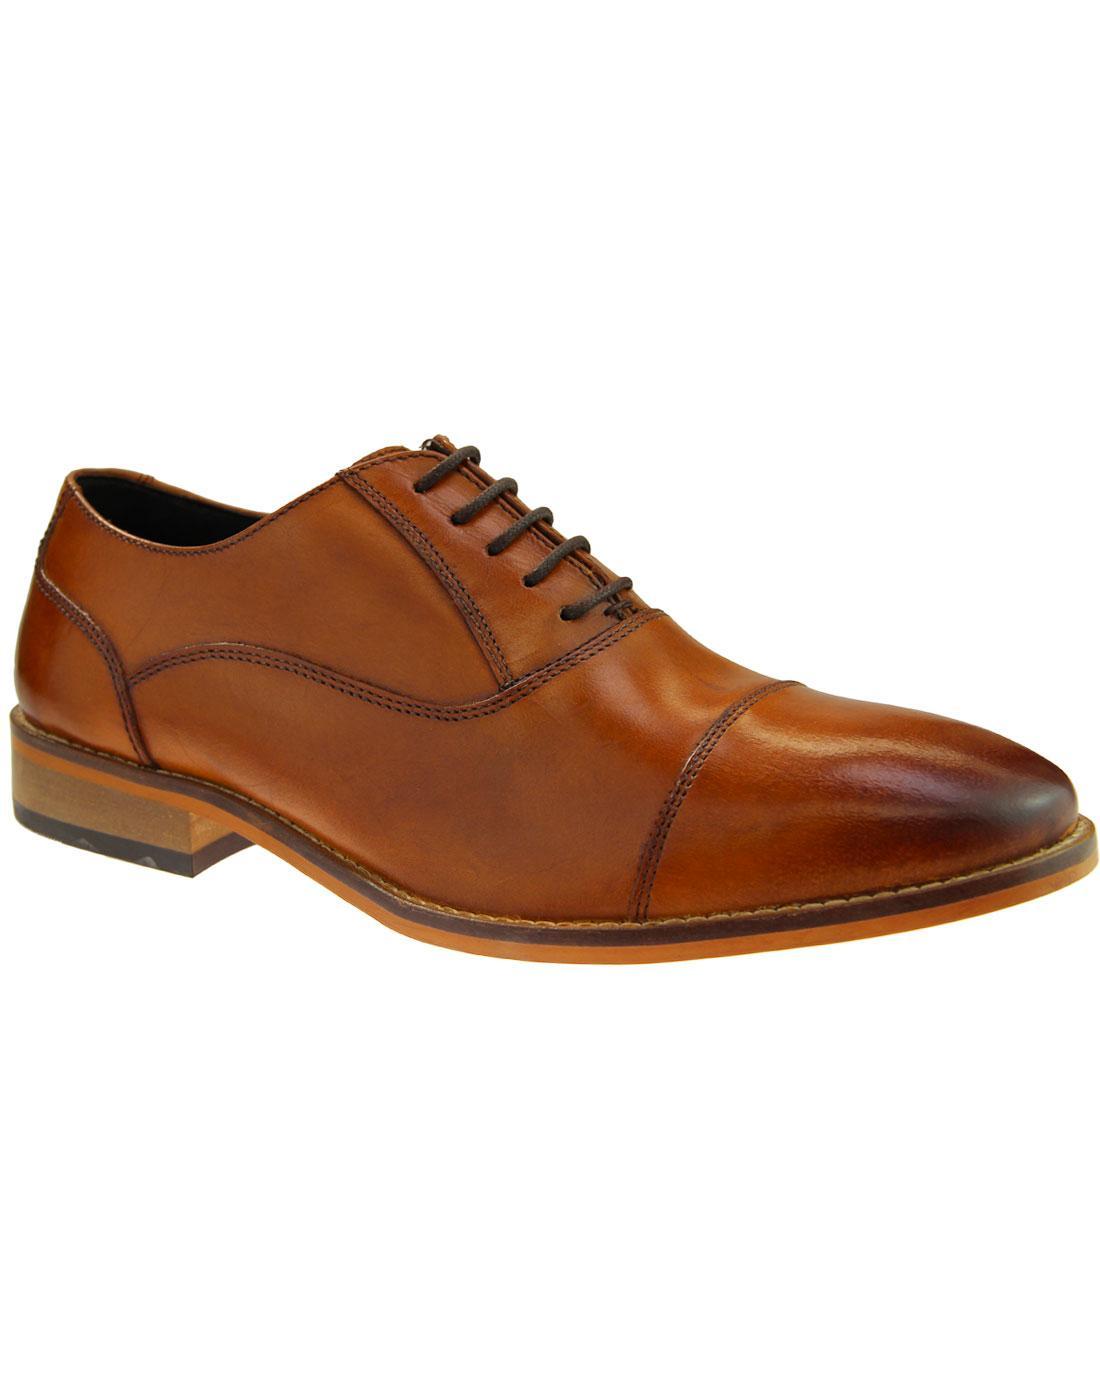 Toby IKON Men's Retro Mod Toe Cap Oxford Shoes TAN